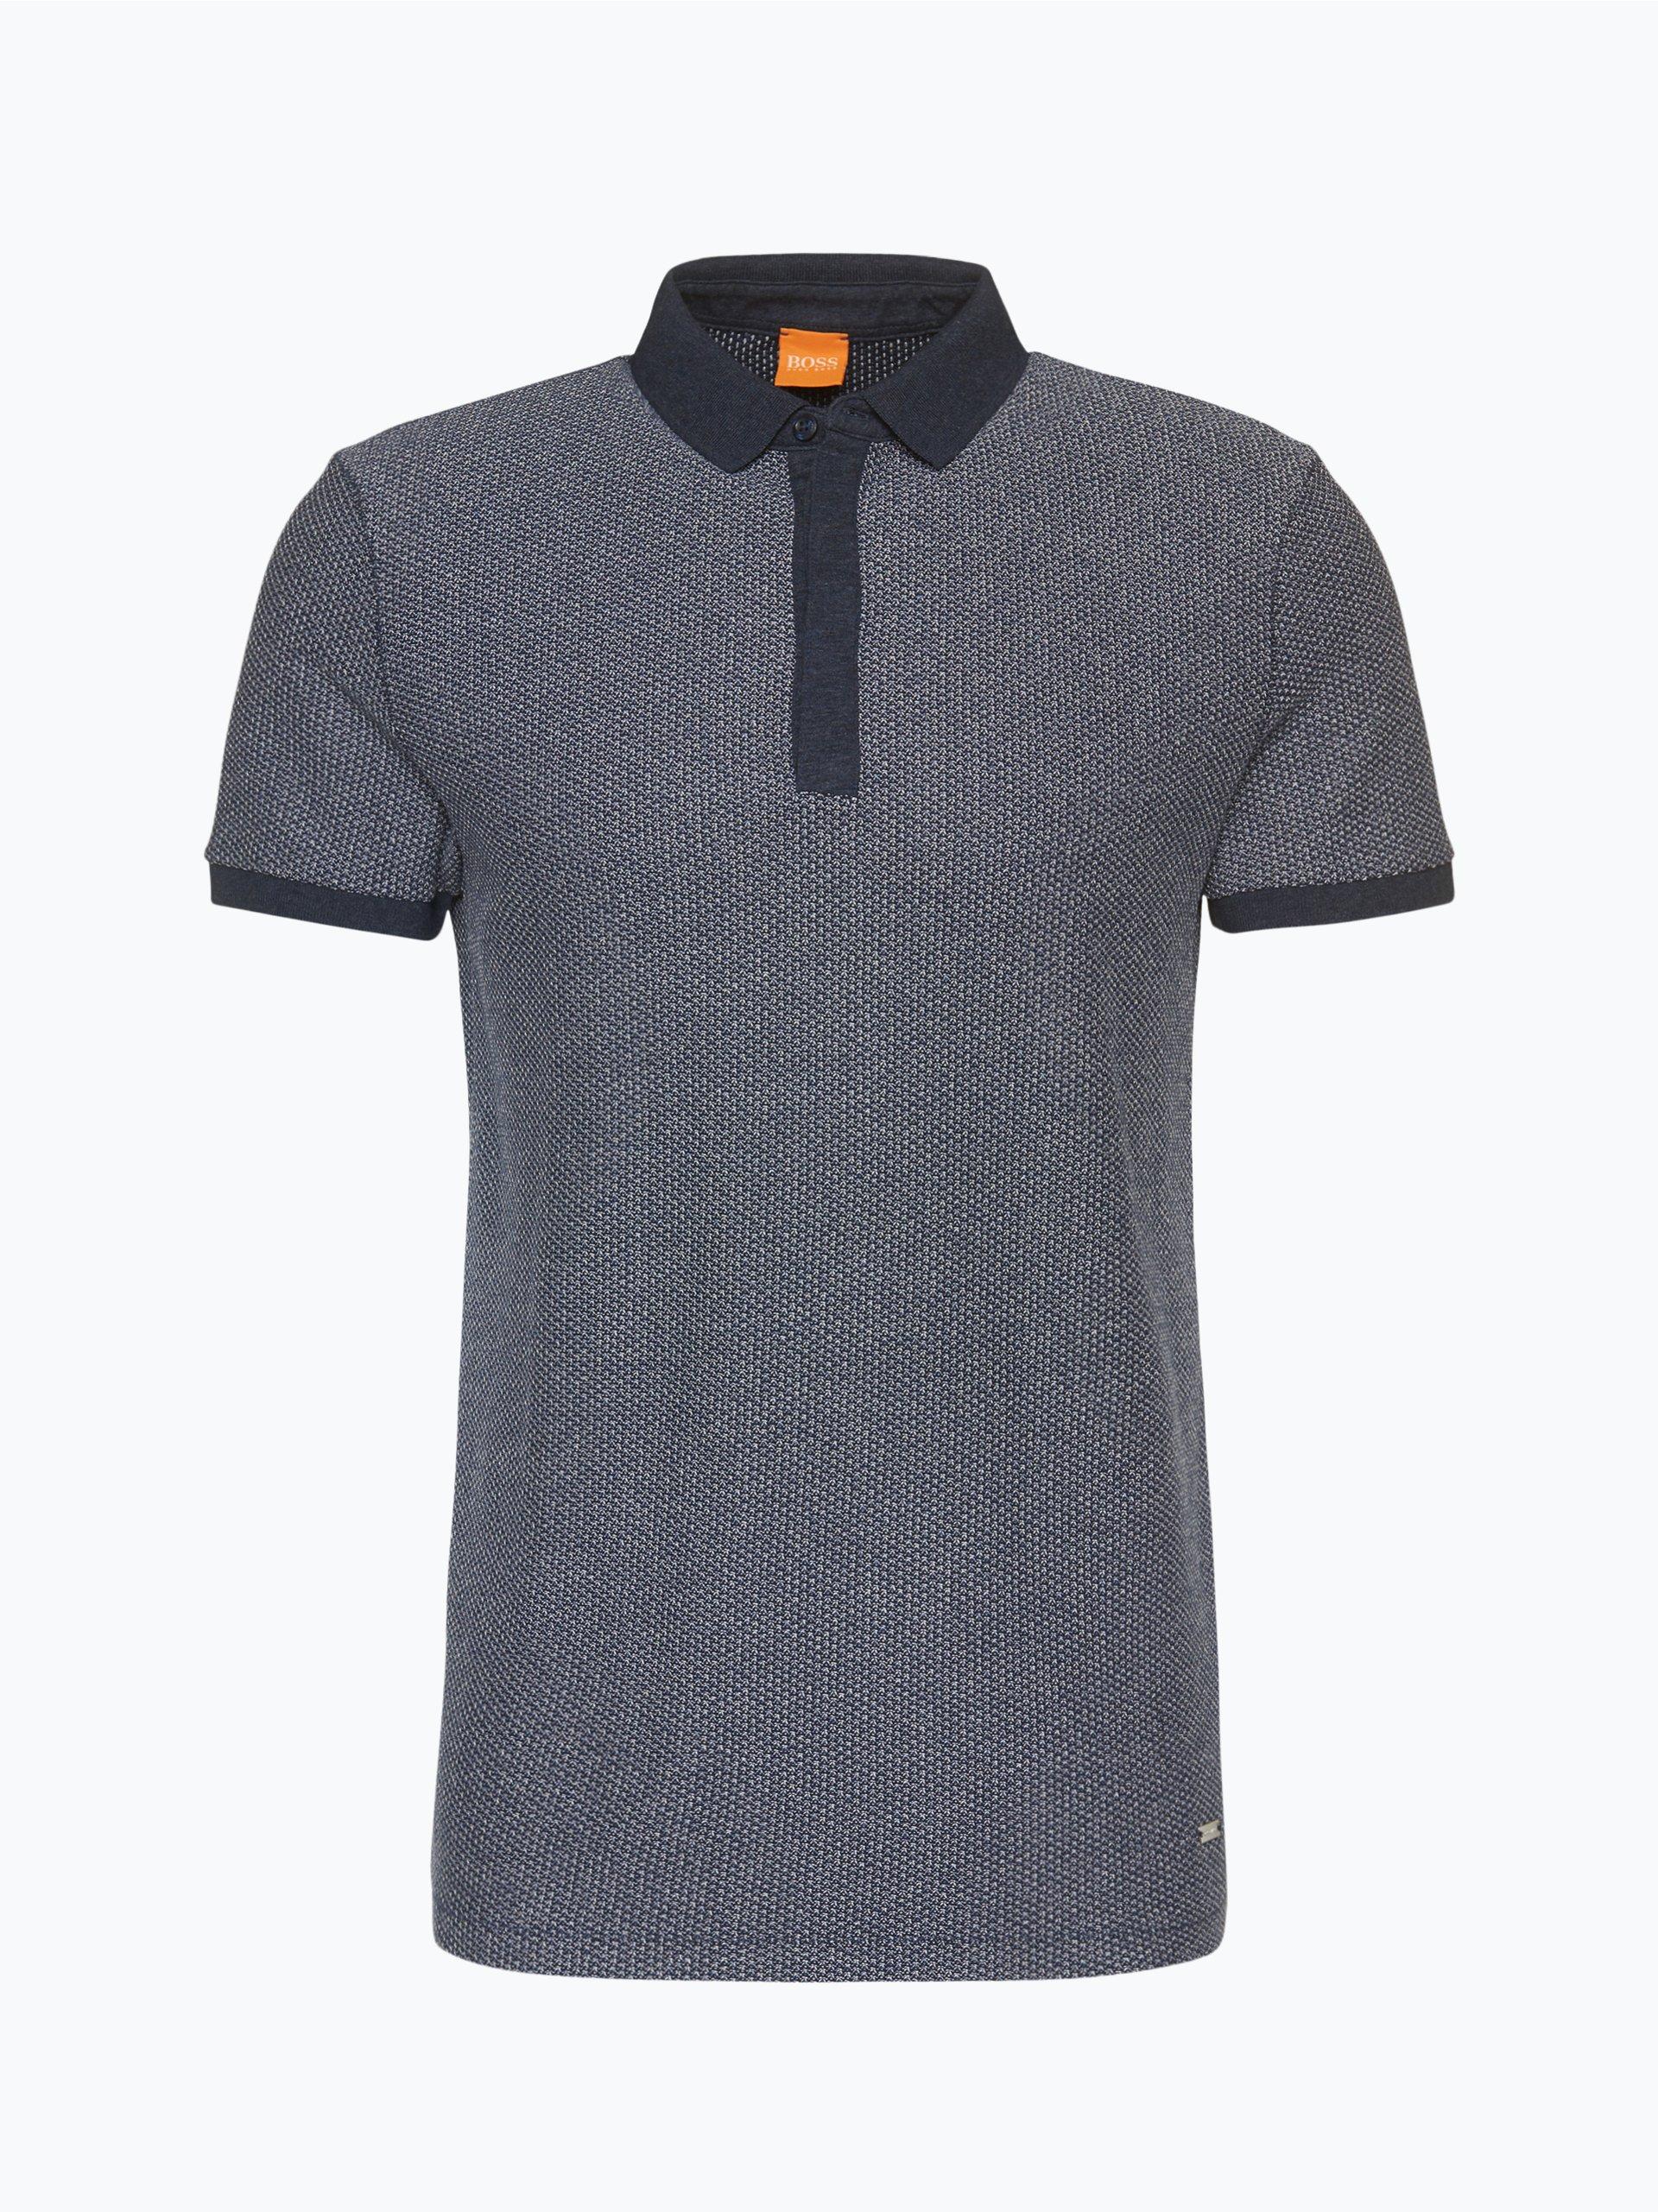 BOSS Casual Herren Poloshirt - Persys